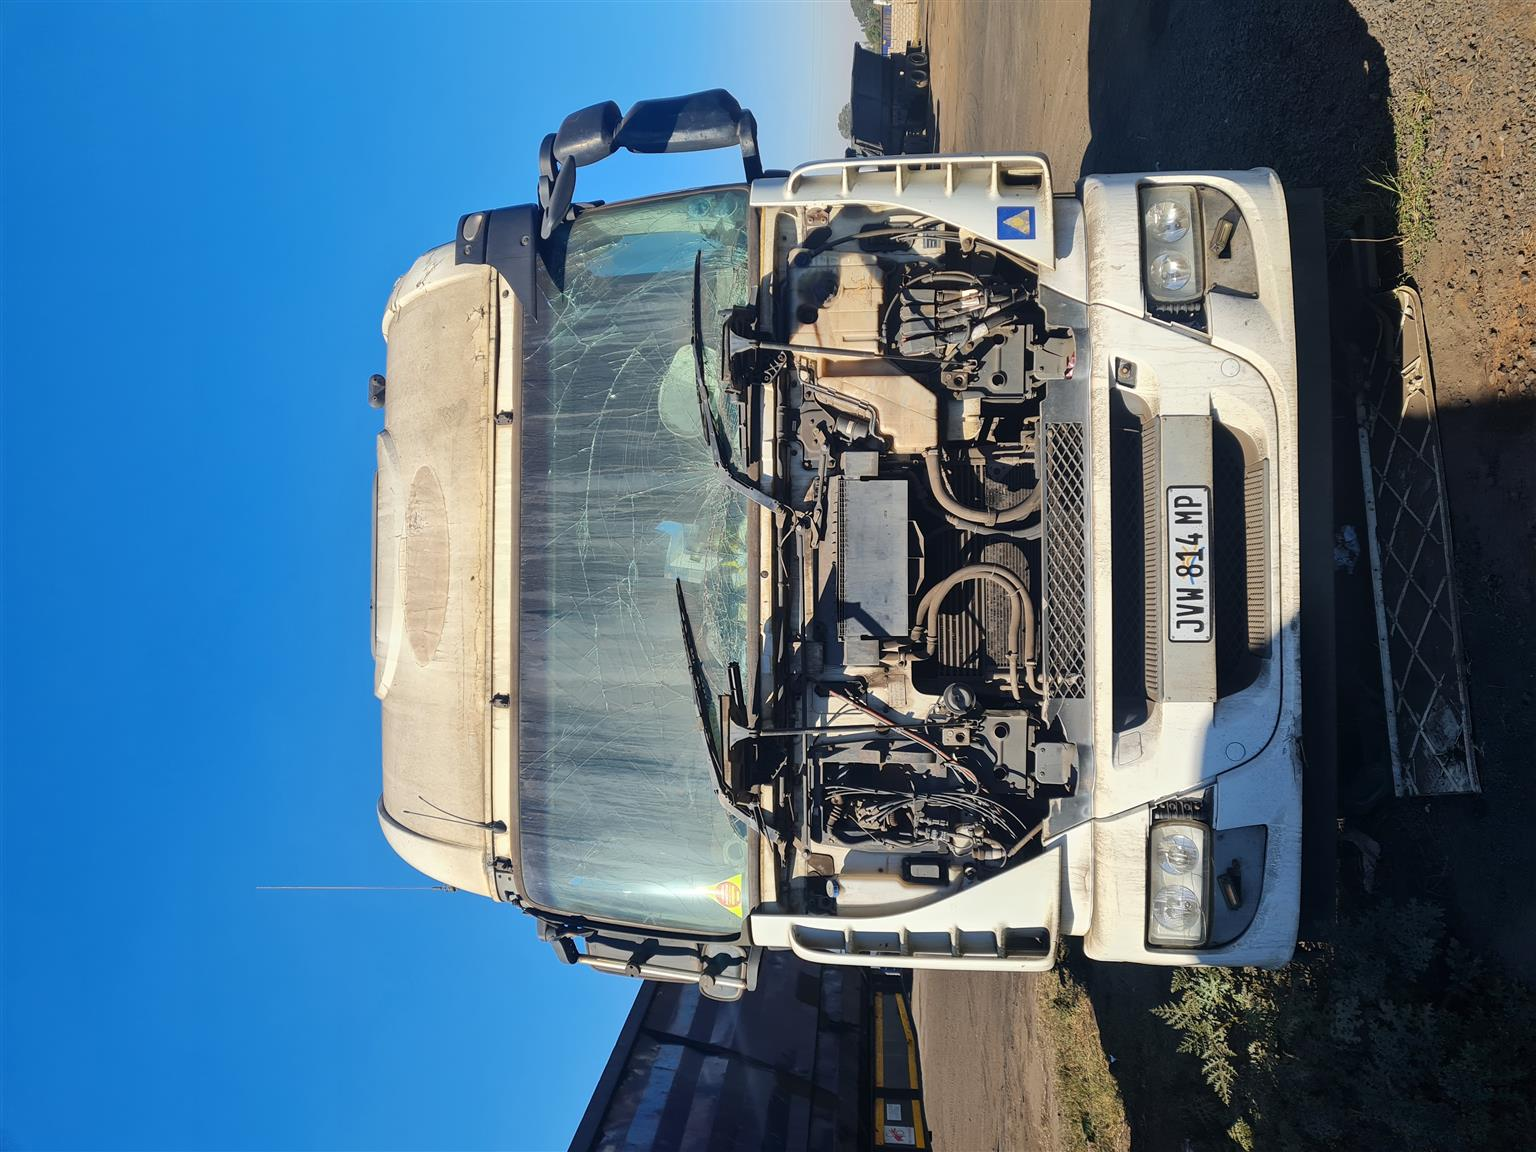 Iveco, Stralis, 480, no engine